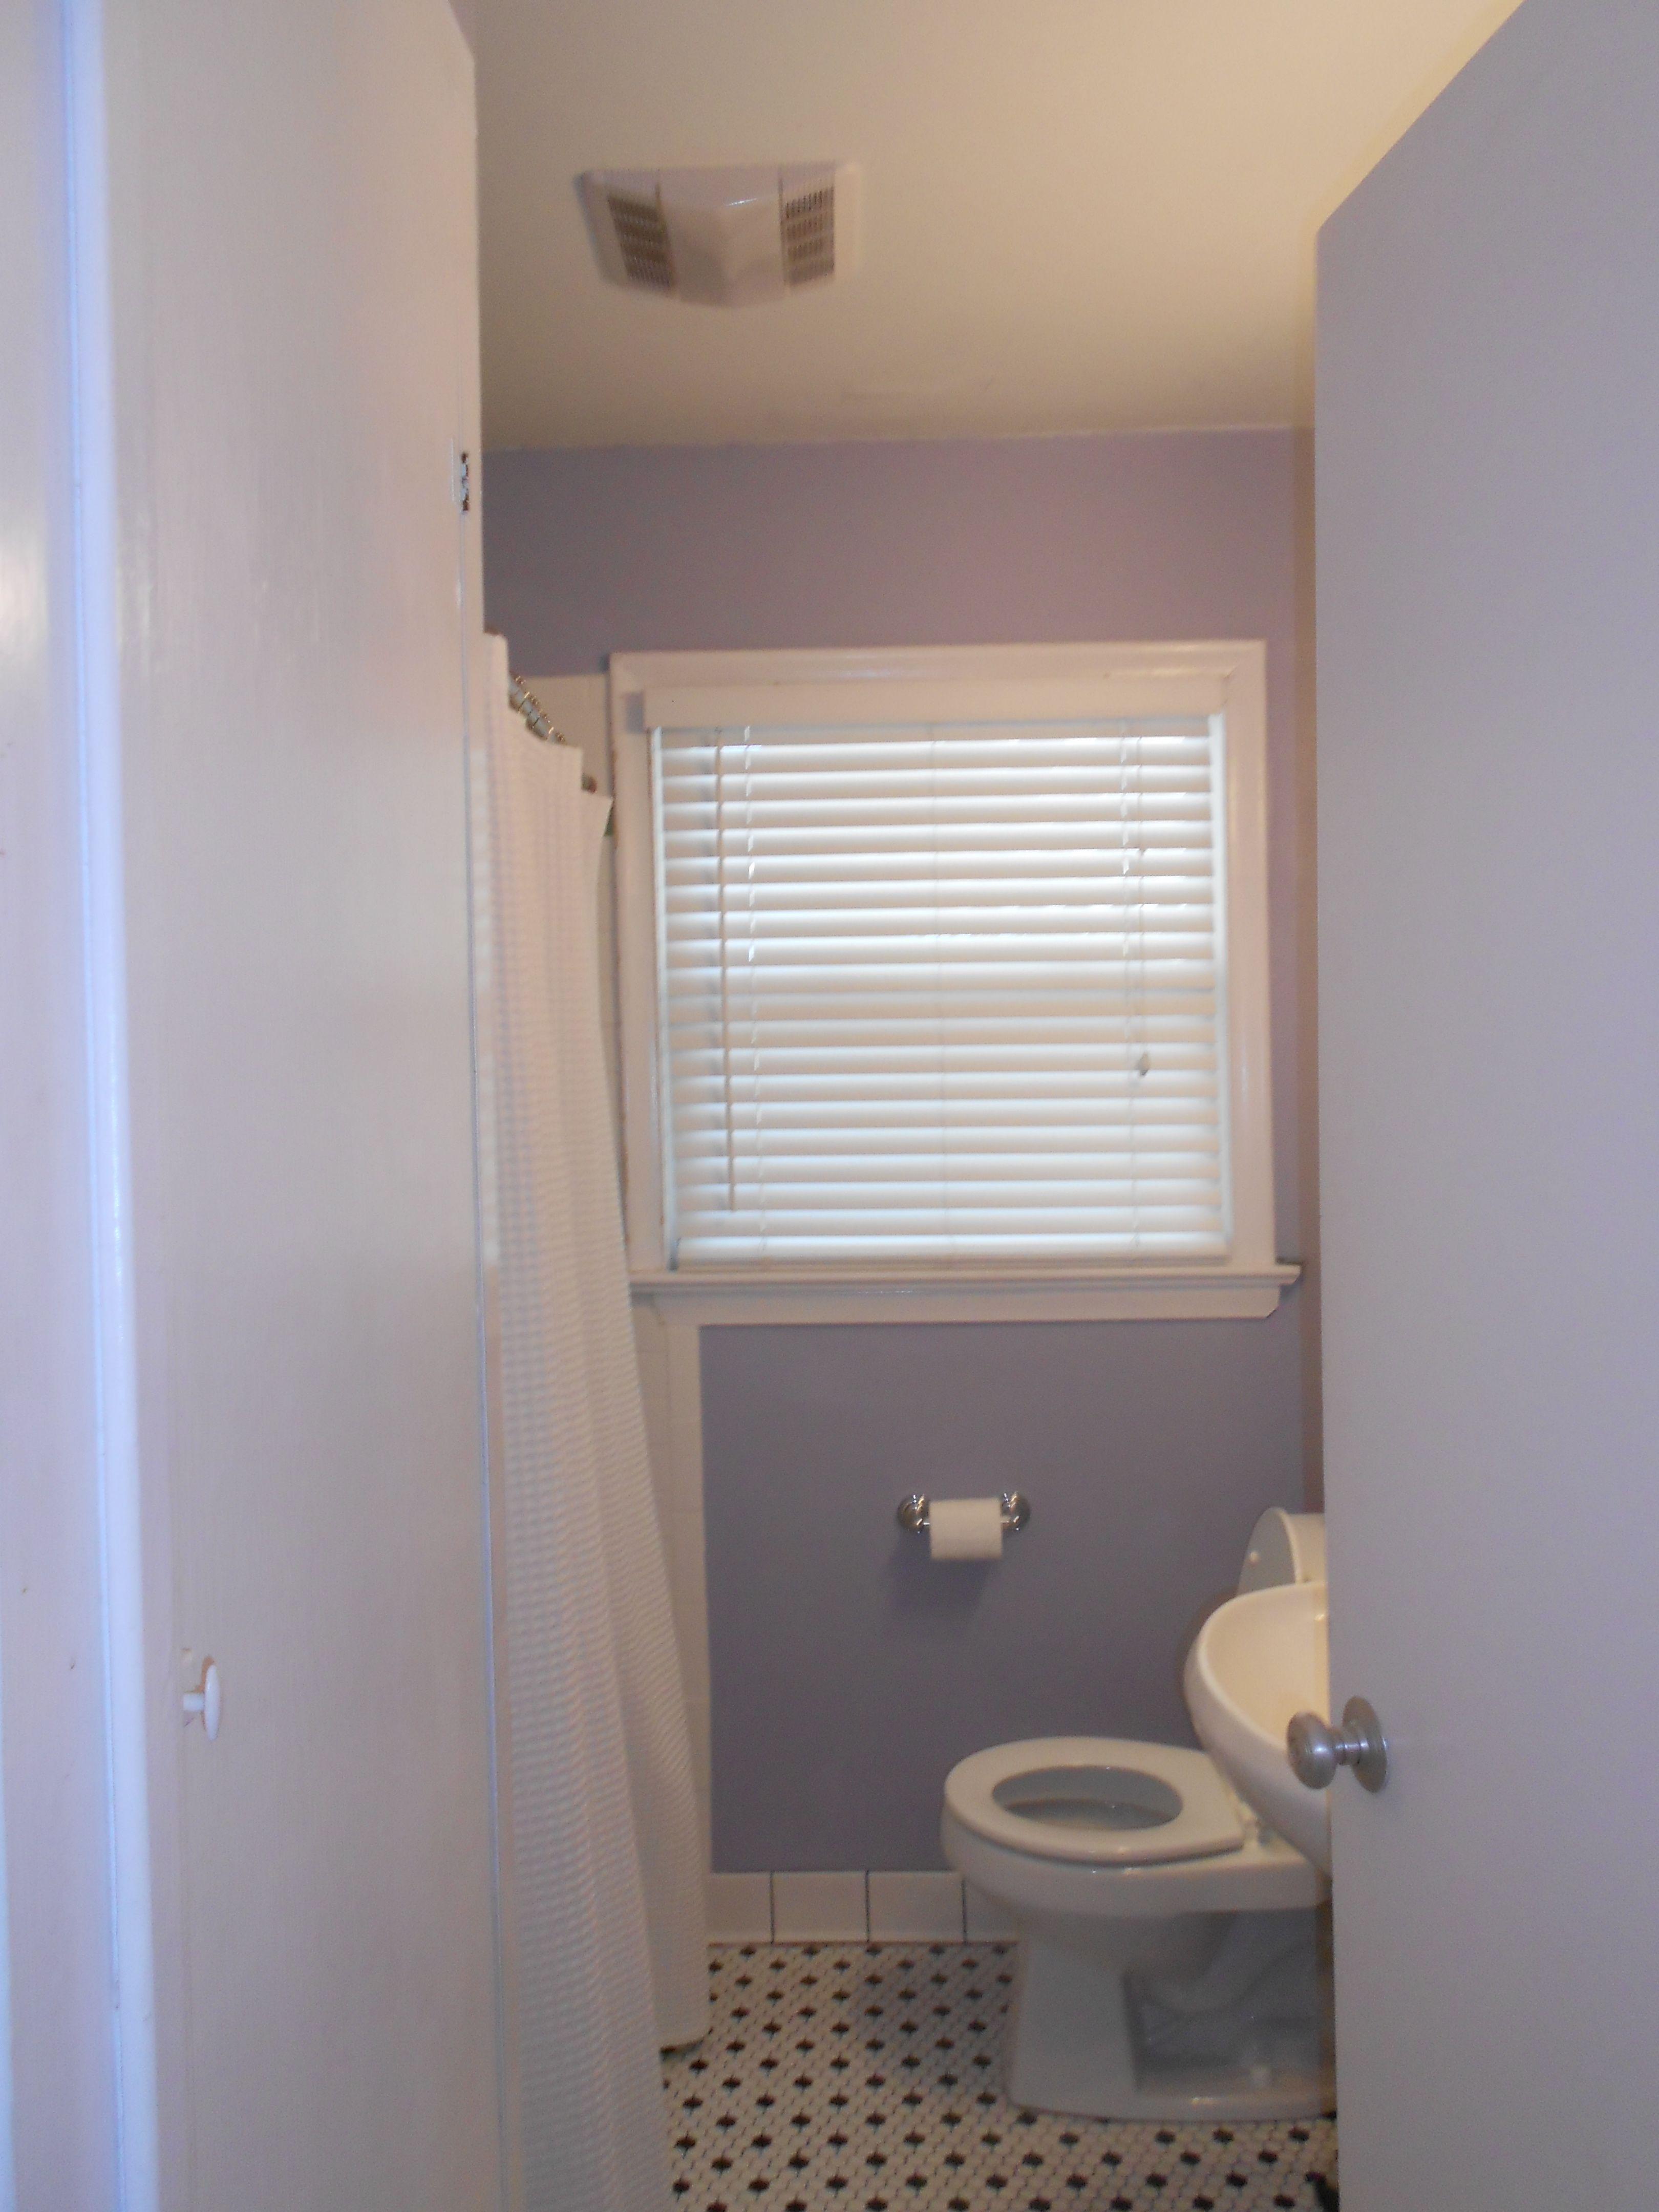 S Bathroom Remodel Home Sweet Home Pinterest Basements And - 1940s bathroom remodel